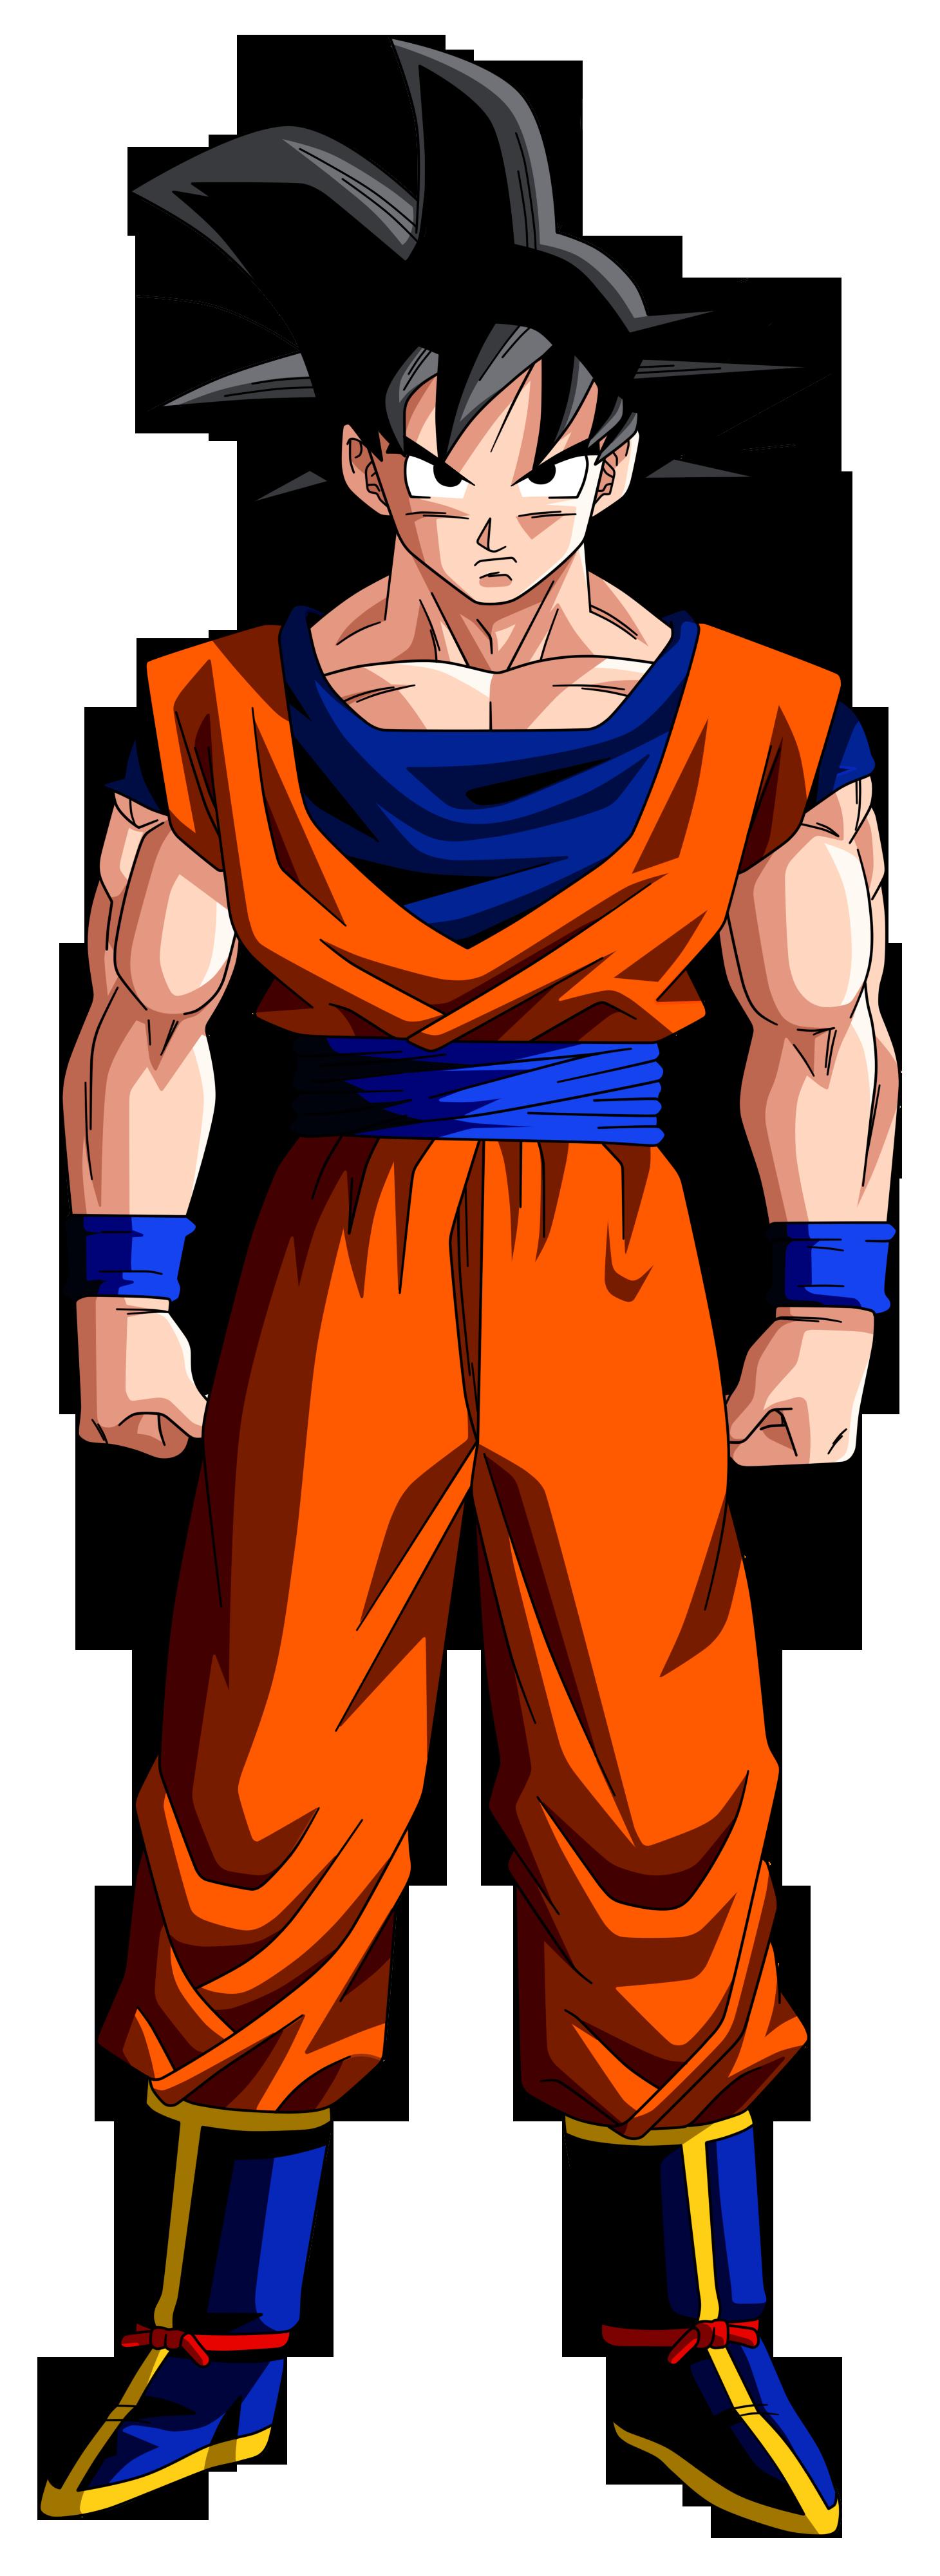 Goku multiverse saga fanon. Weight clipart injustice